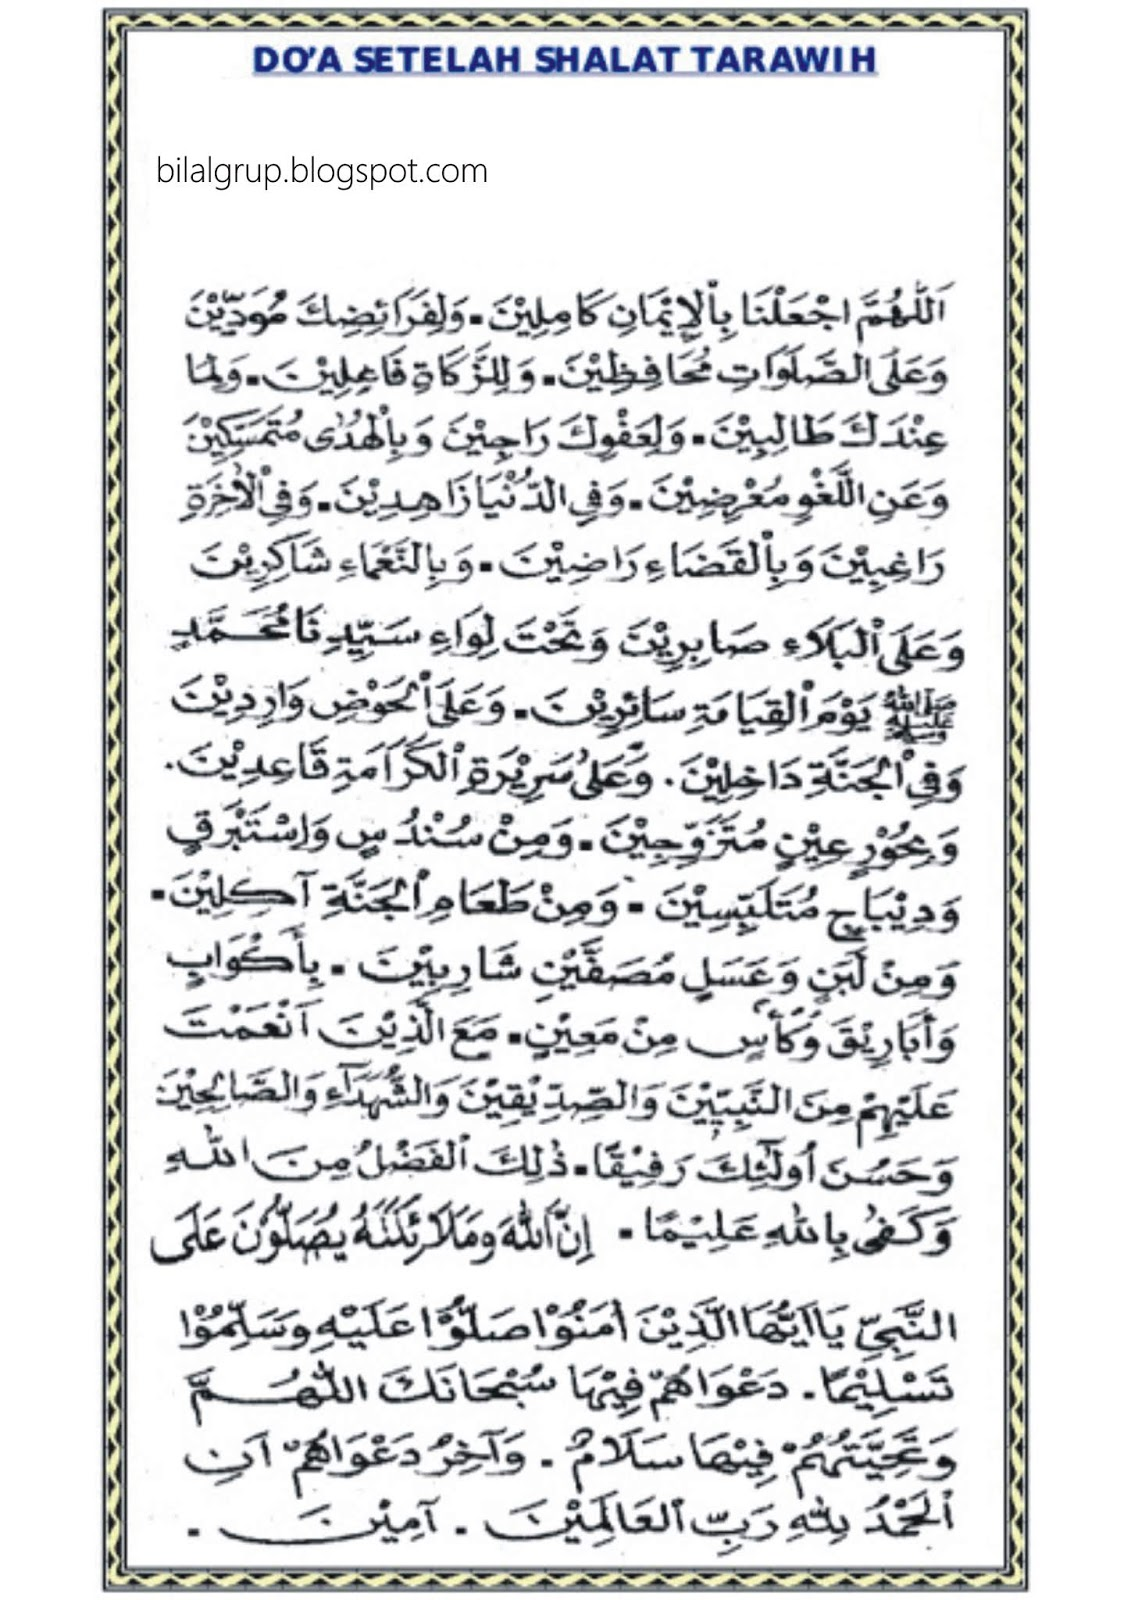 Doa Witir Setelah Sholat Tarawih : witir, setelah, sholat, tarawih, Bilal, Foundation:, 05/23/18